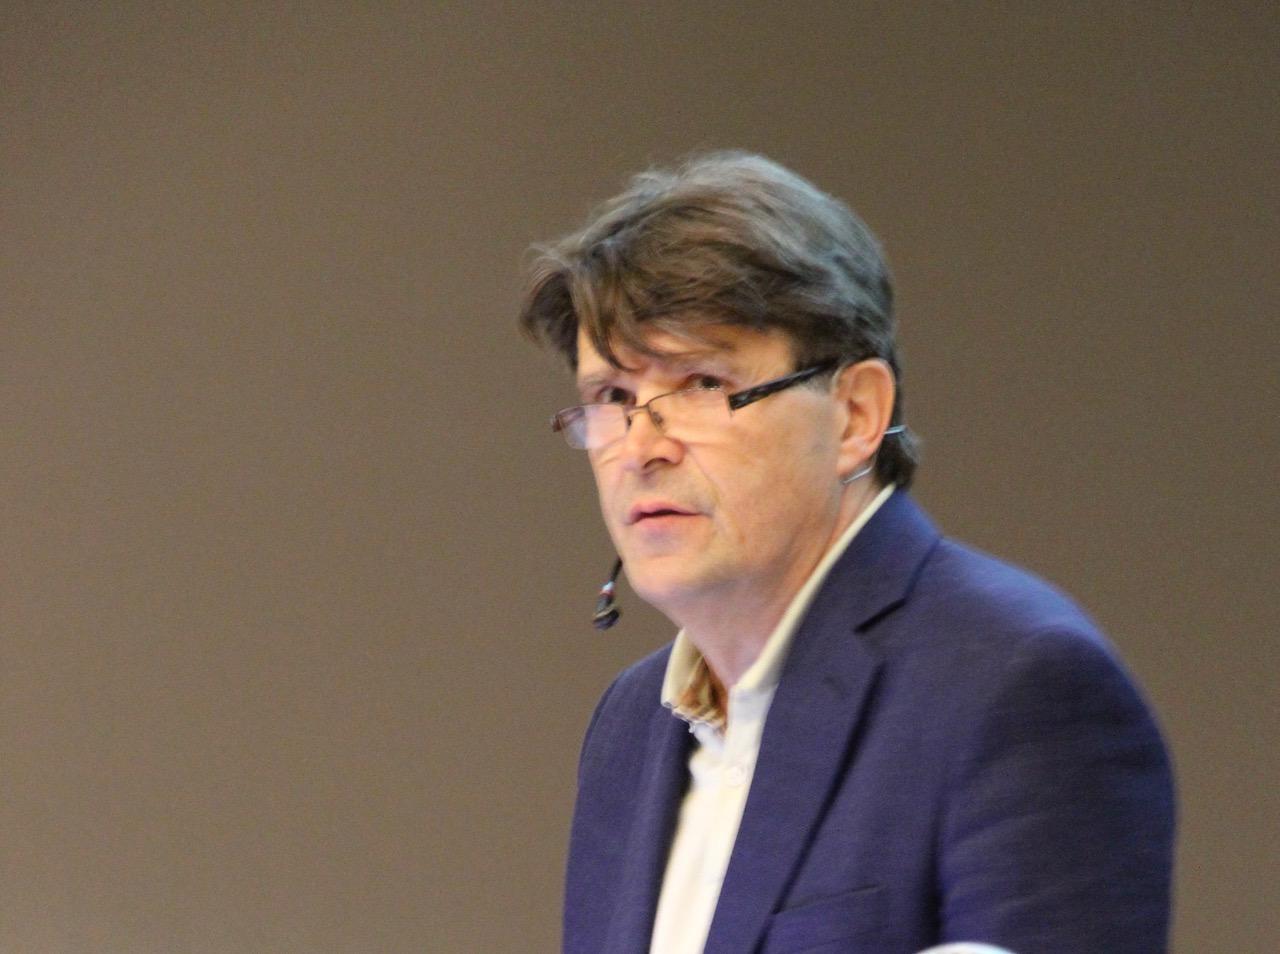 Olav Røise. Foto: Live Oftedahl